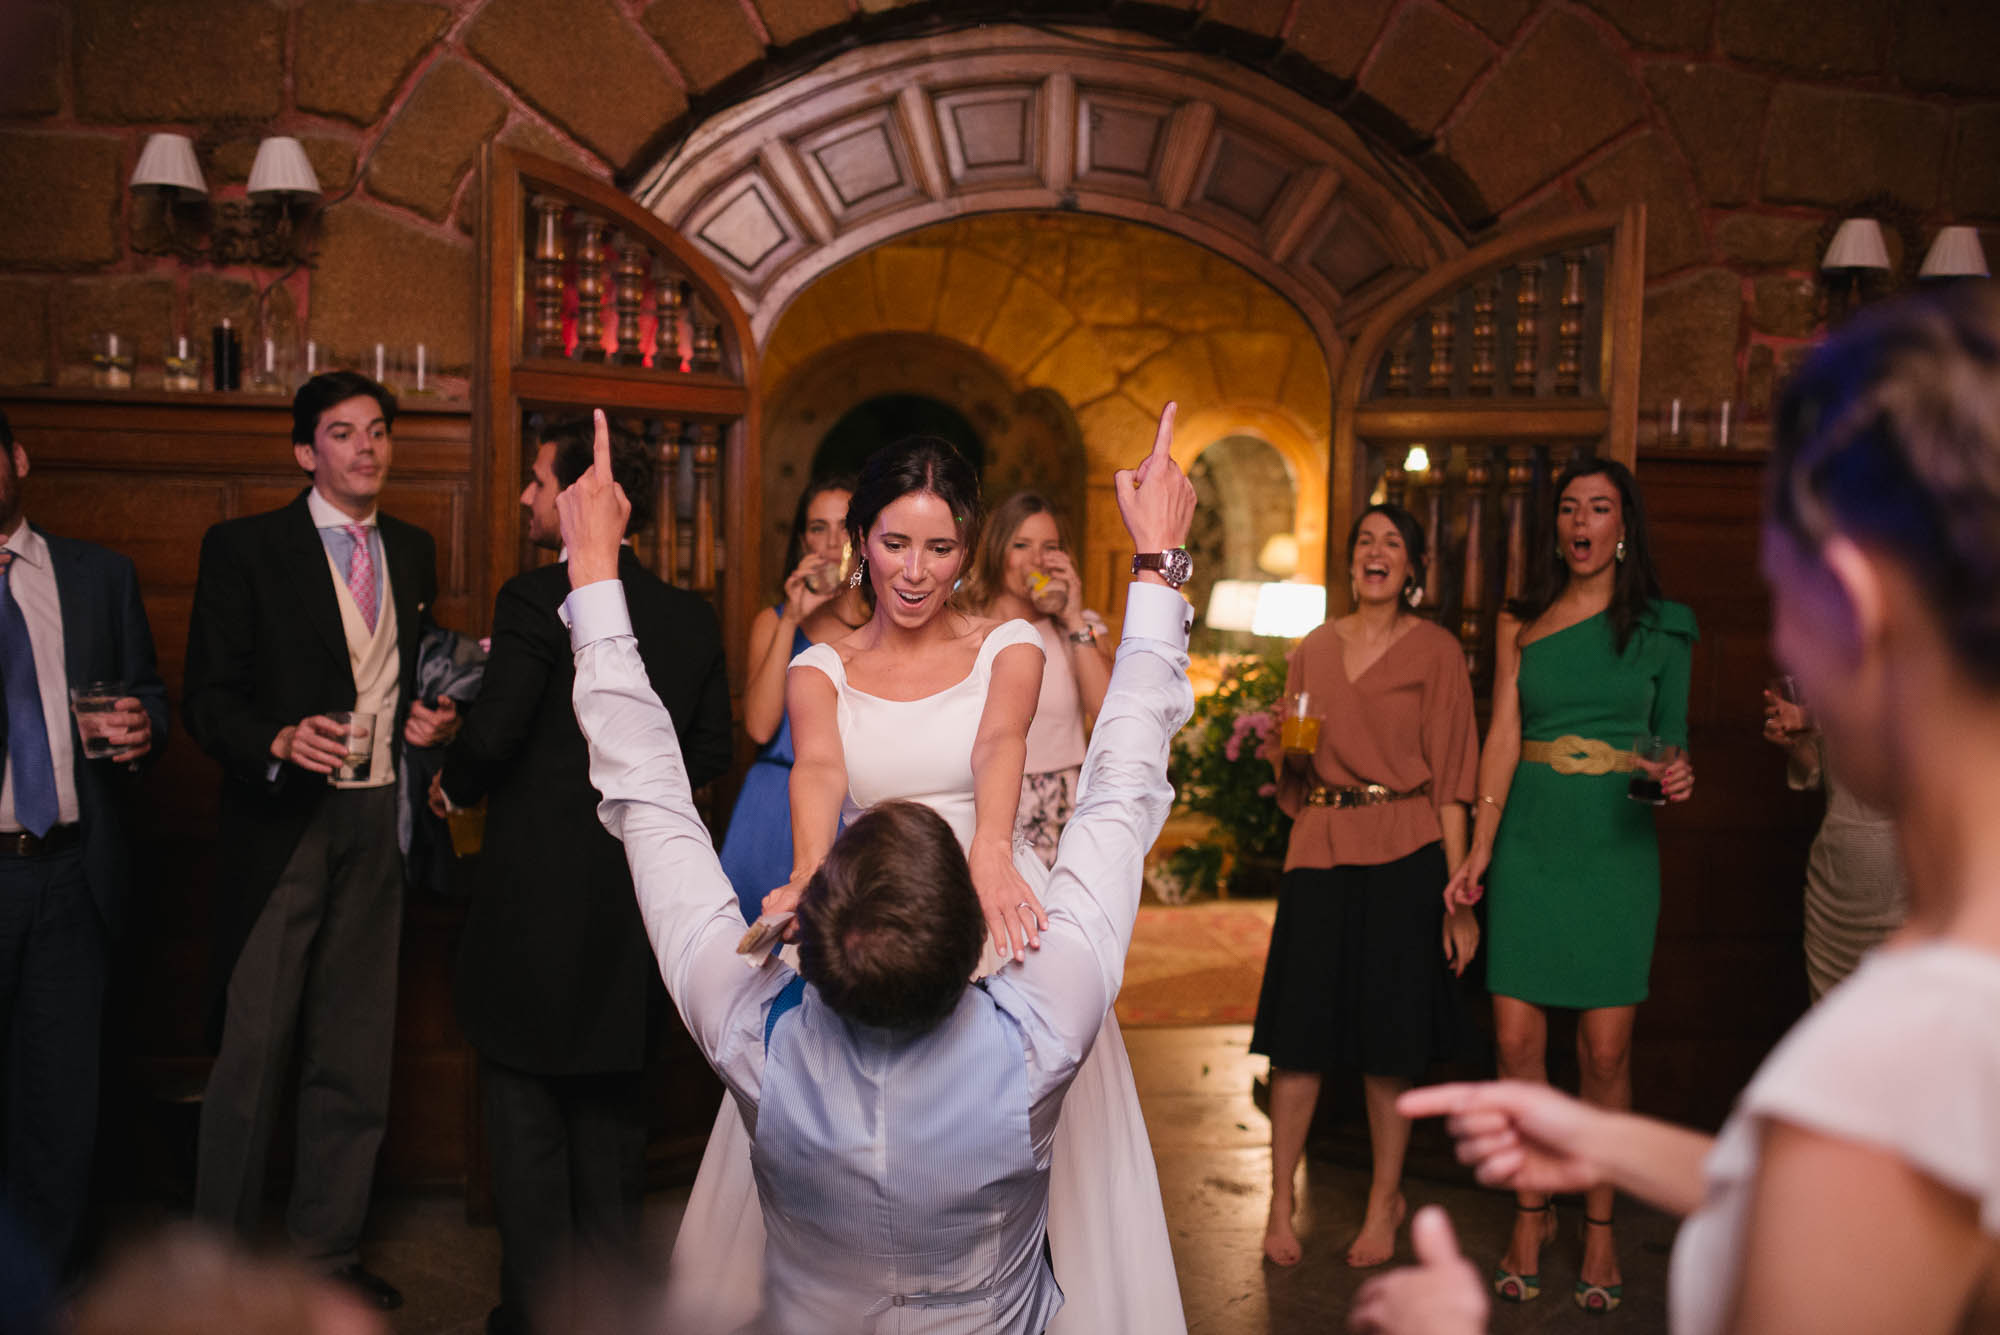 La novia baila con el novio en la fiesta